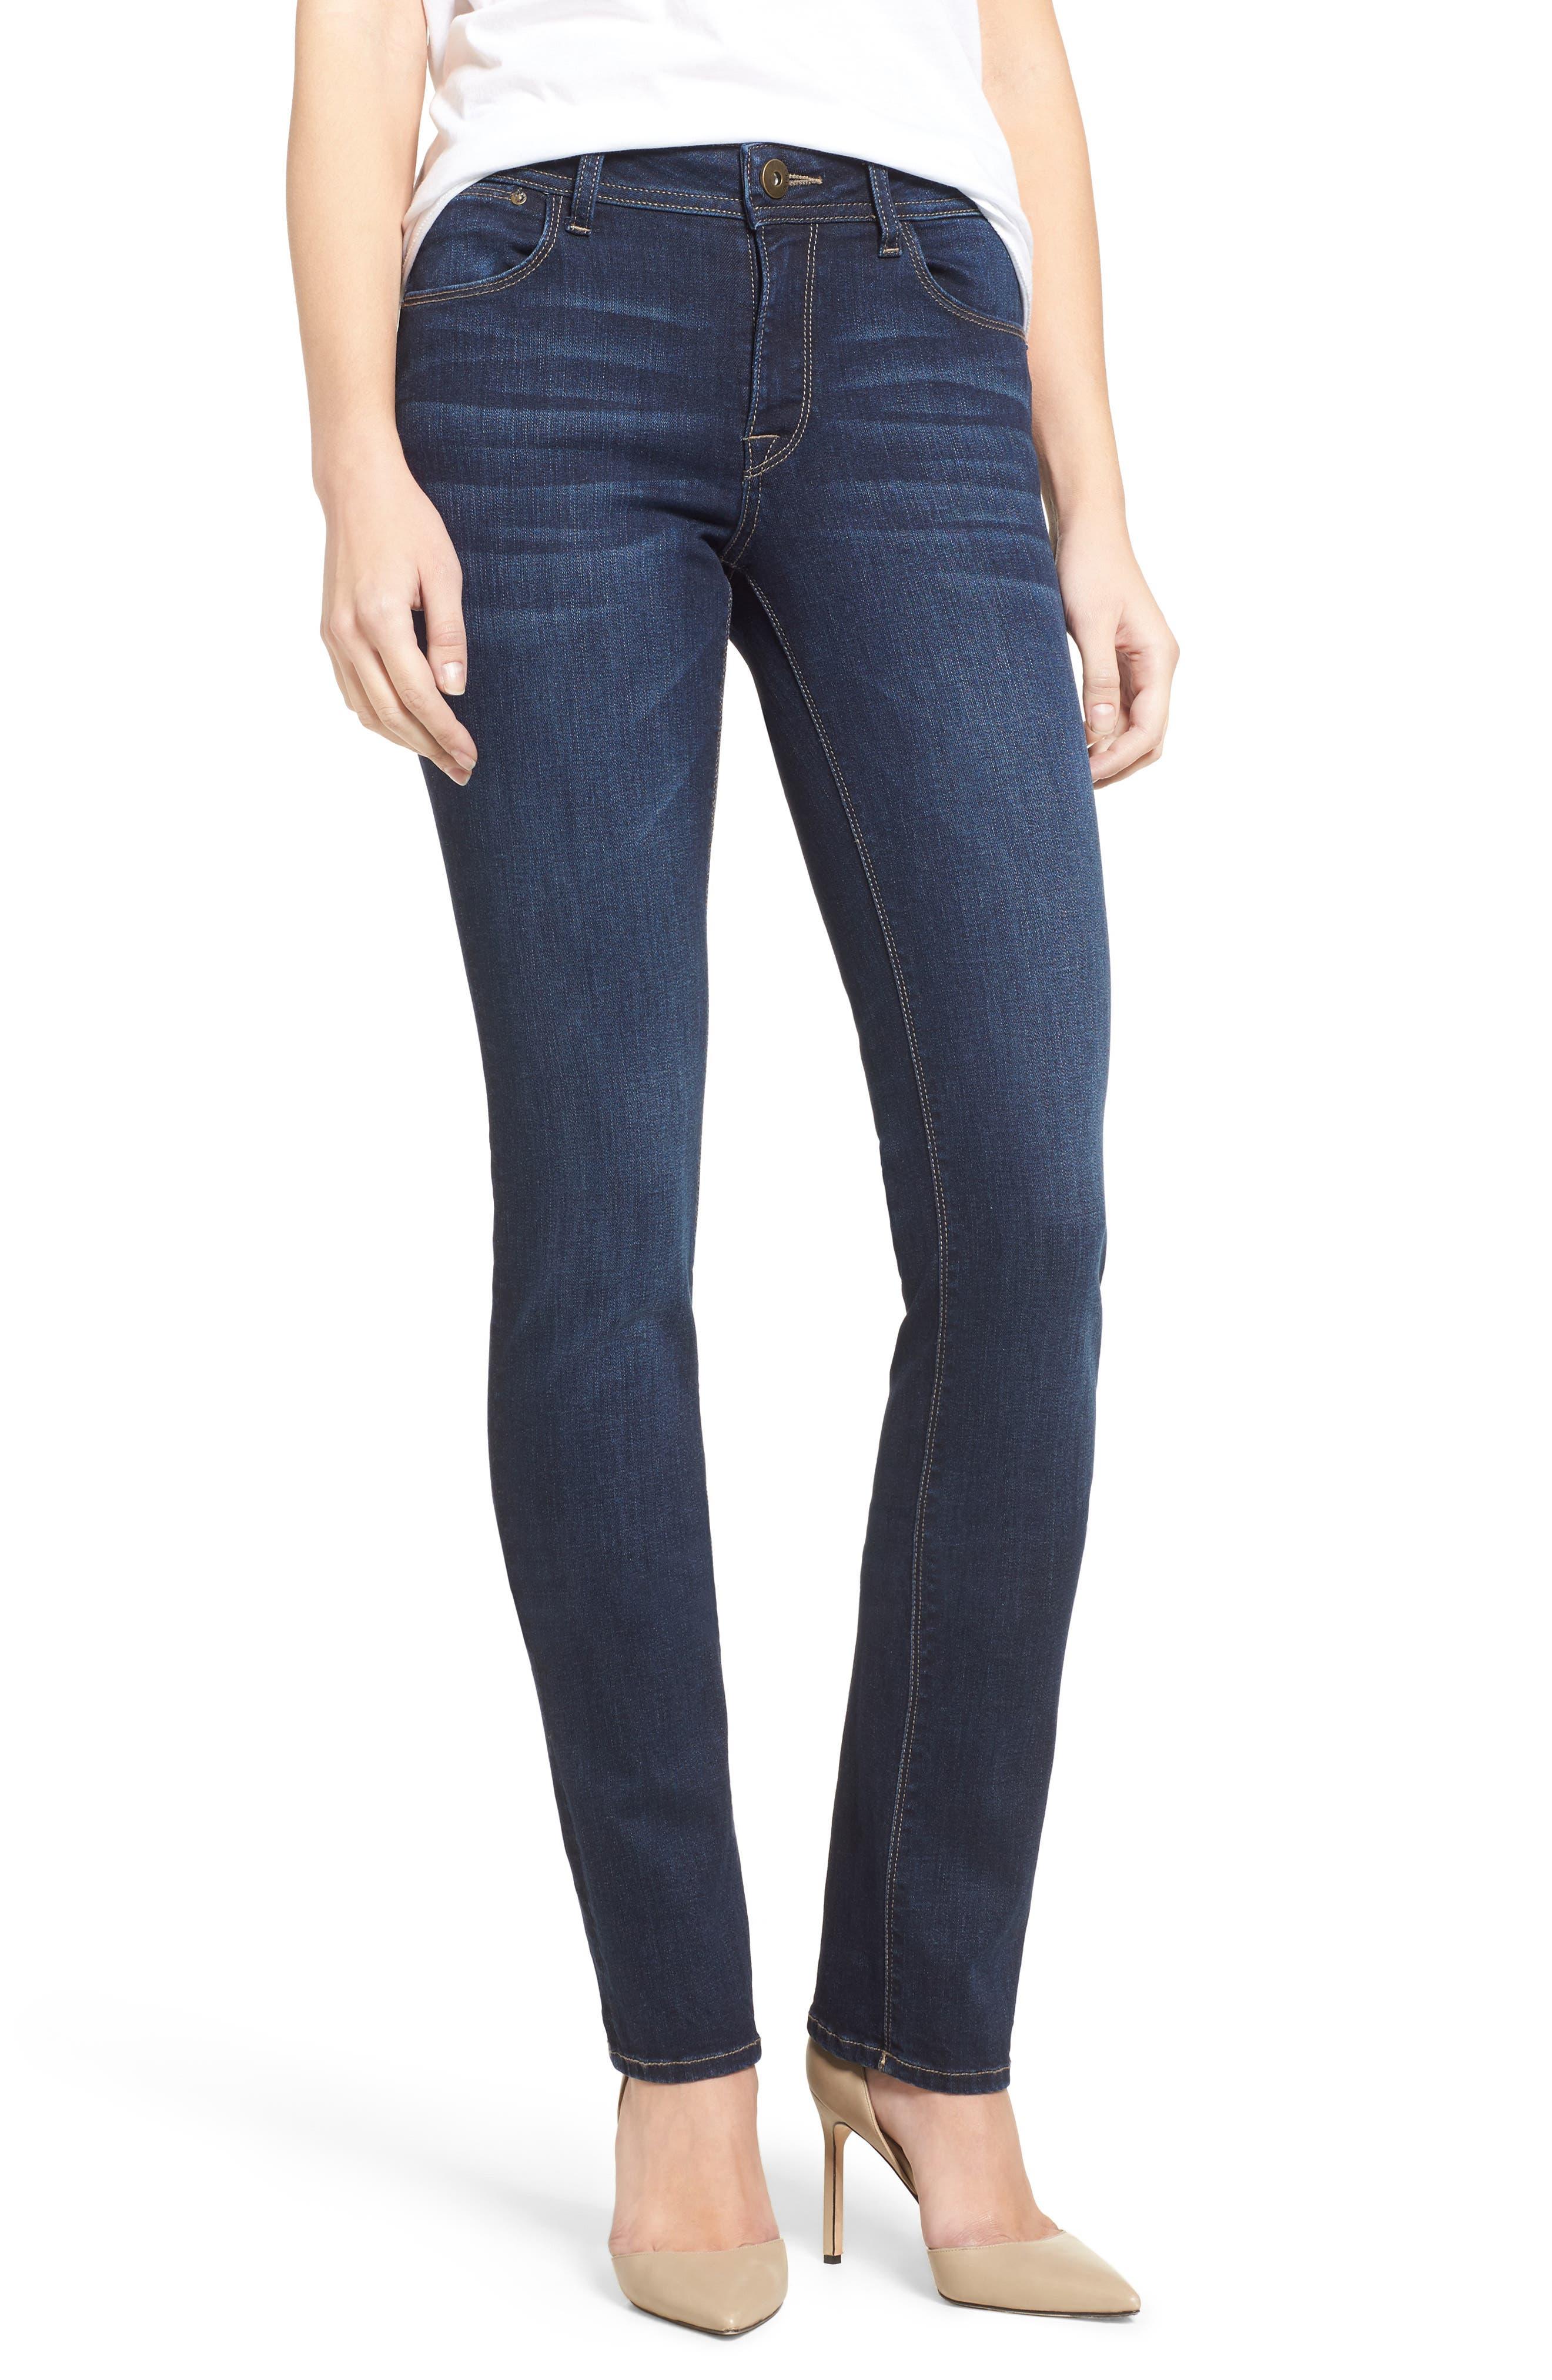 'Coco' Curvy Slim Straight Leg Jeans,                         Main,                         color, Atlas